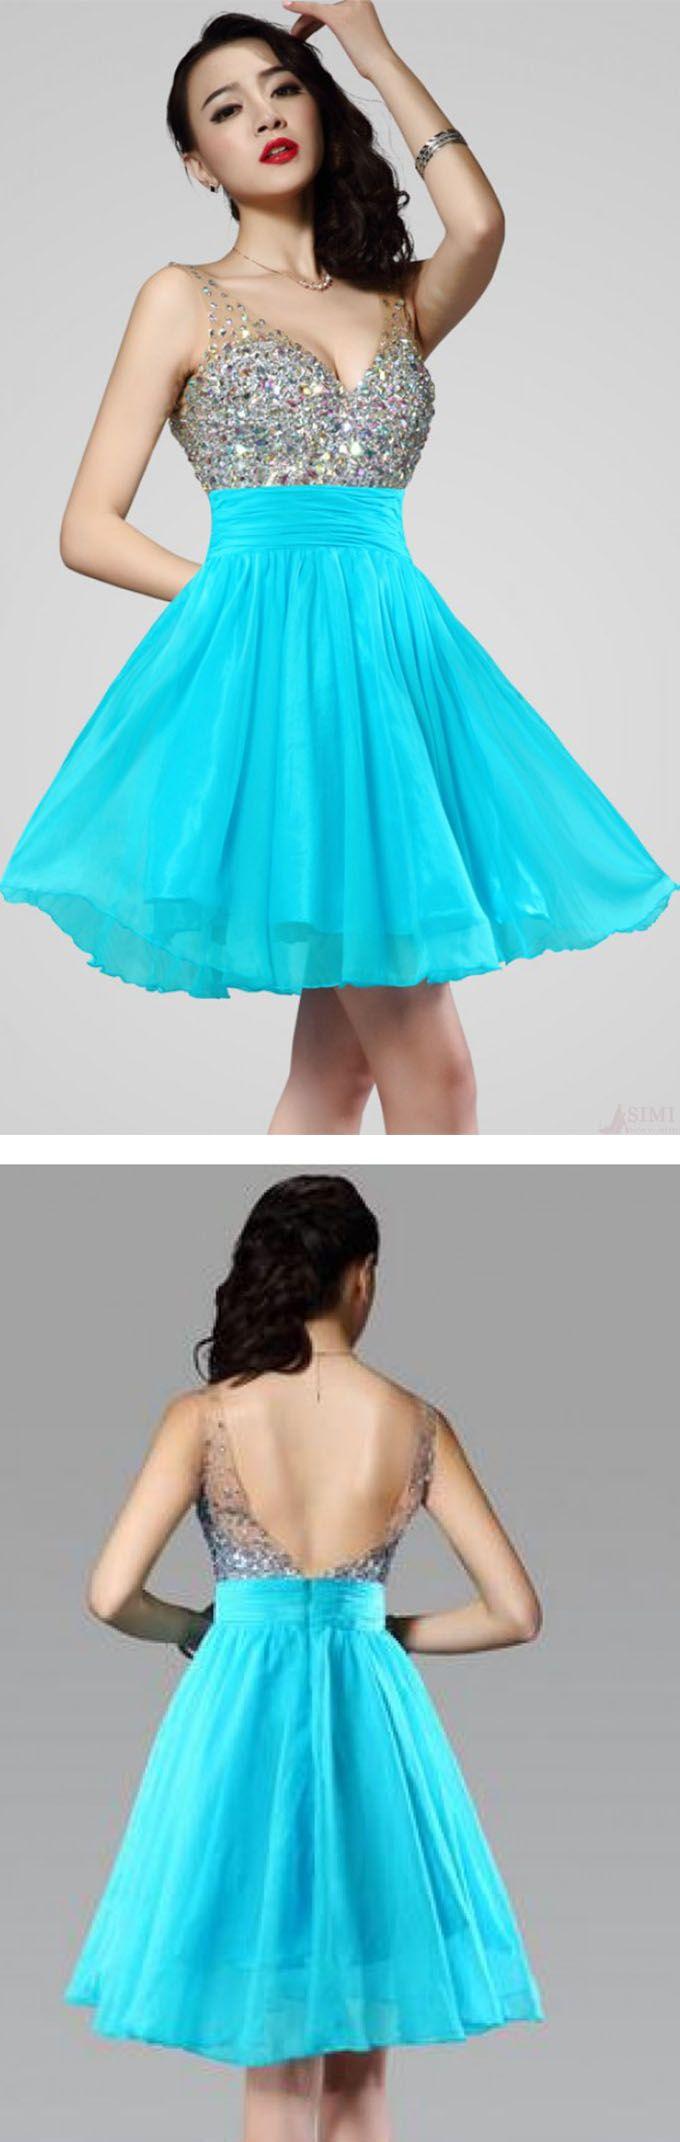 68 best HoCo images on Pinterest | Party wear dresses, Short ...